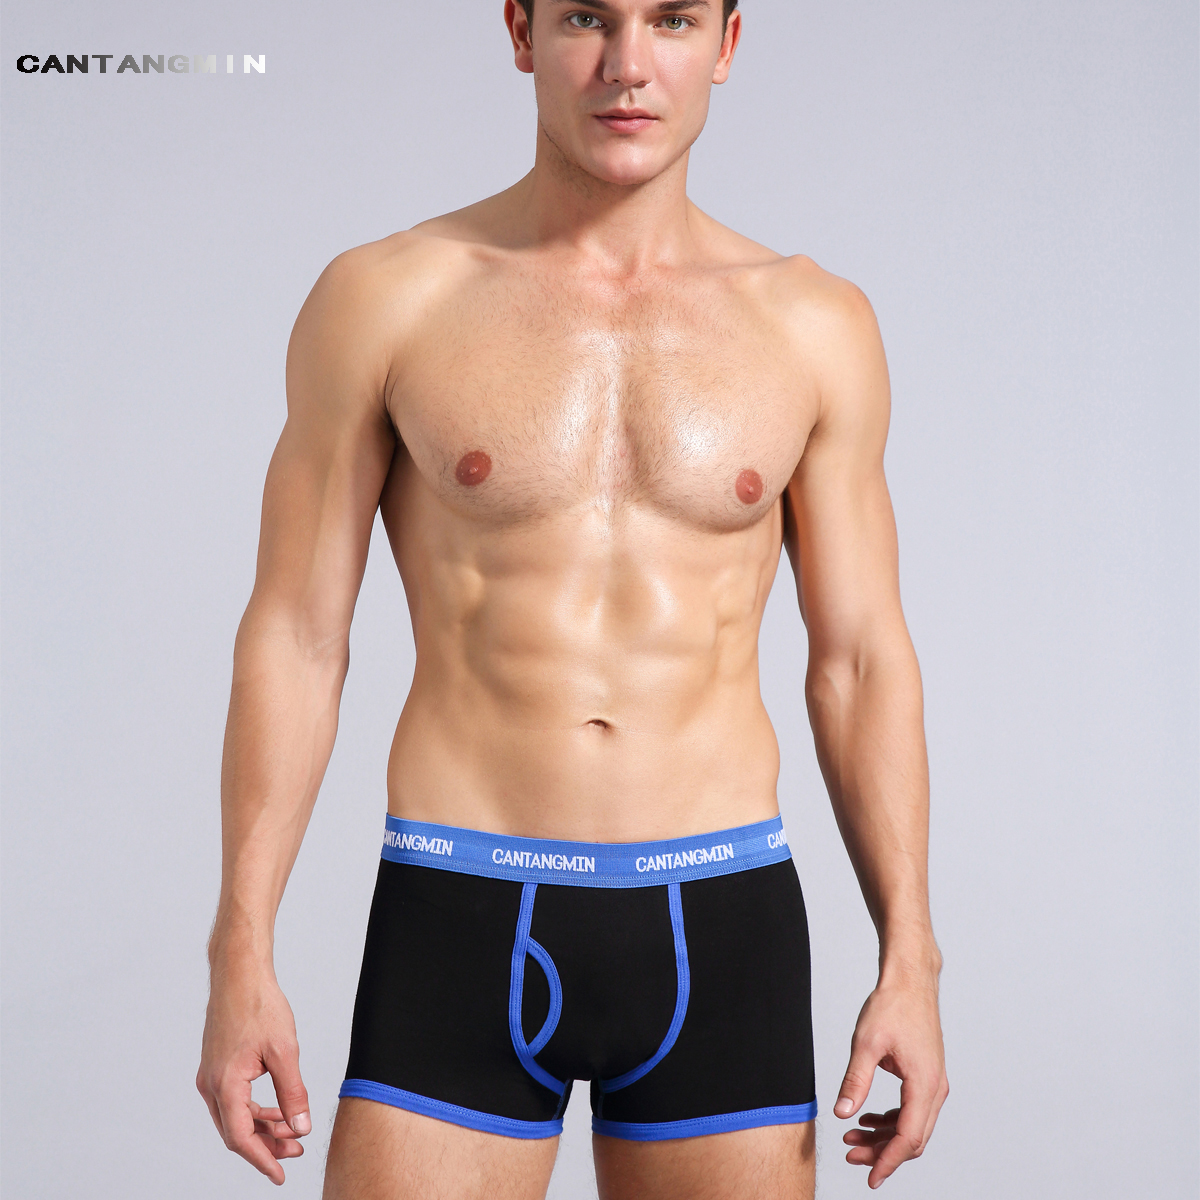 CANTANGMIN Male Panties Cotton Boxers Comfortable Breathable Men's Panties Underwear Man